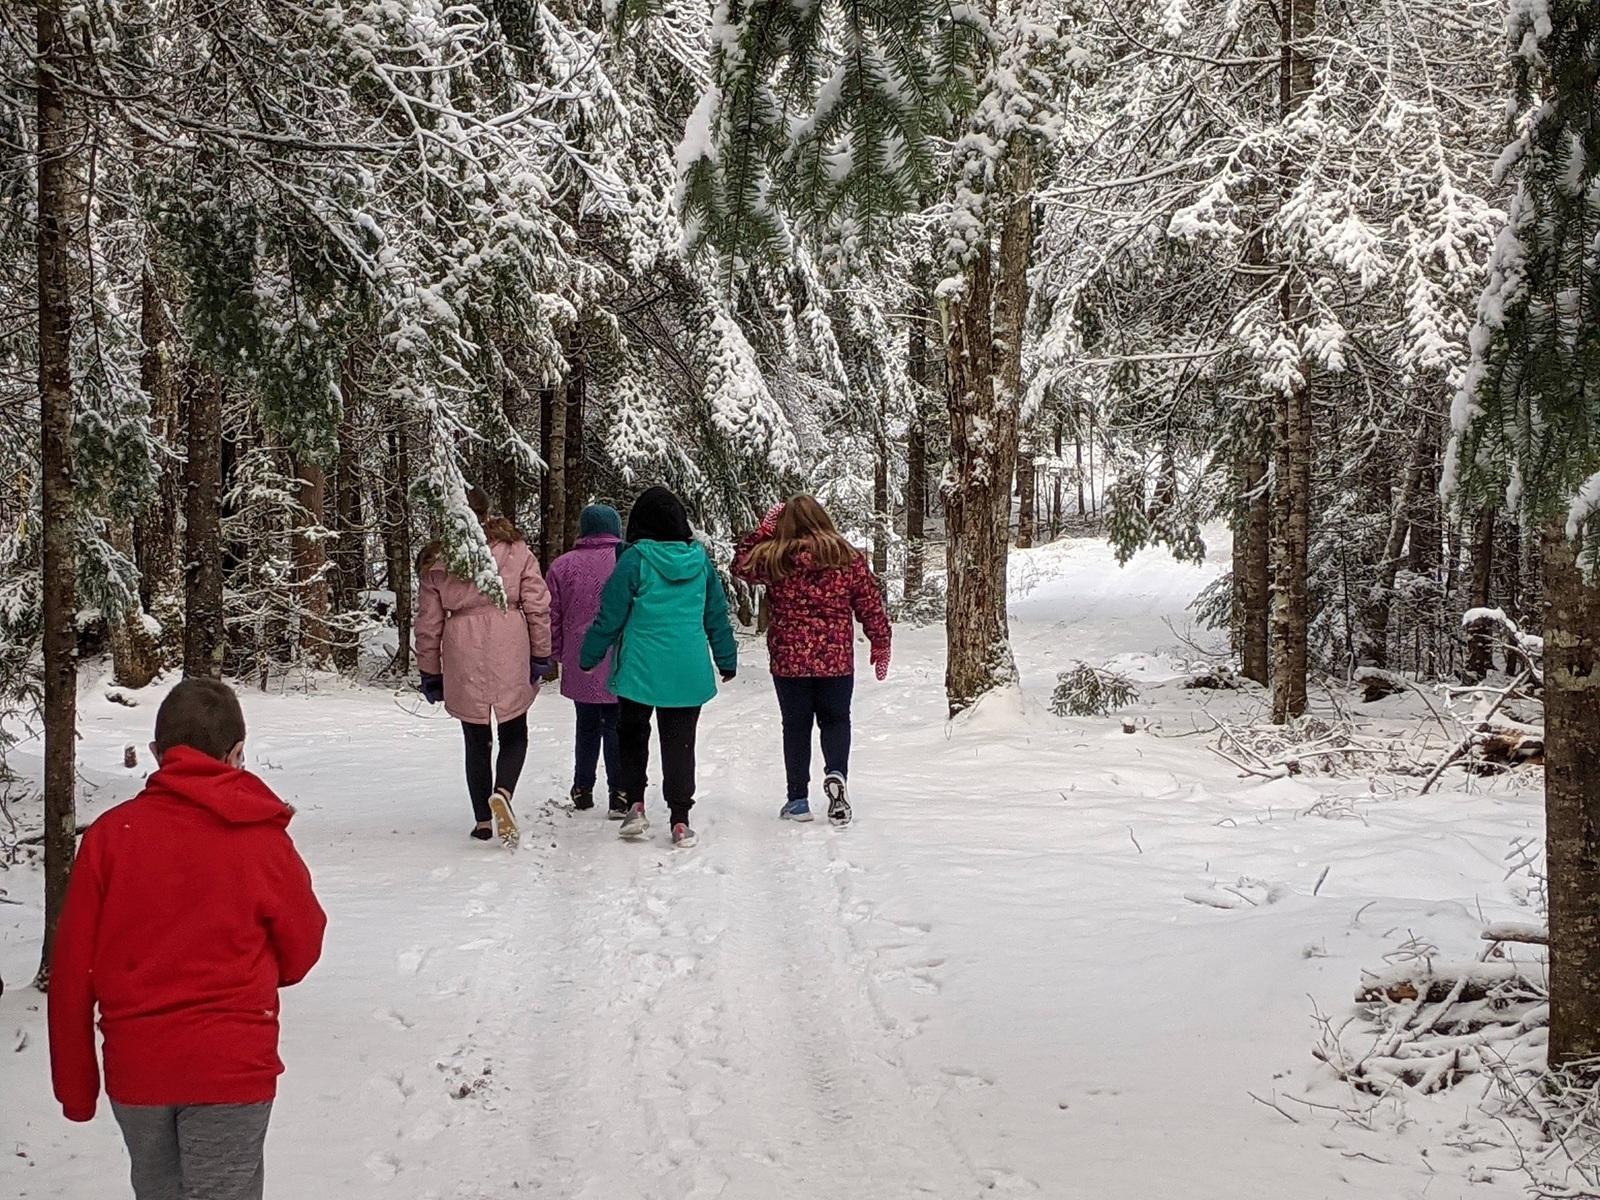 Week 1 5th Grade Rose M Gaffney School Winter Games 2021 Moment of the Week